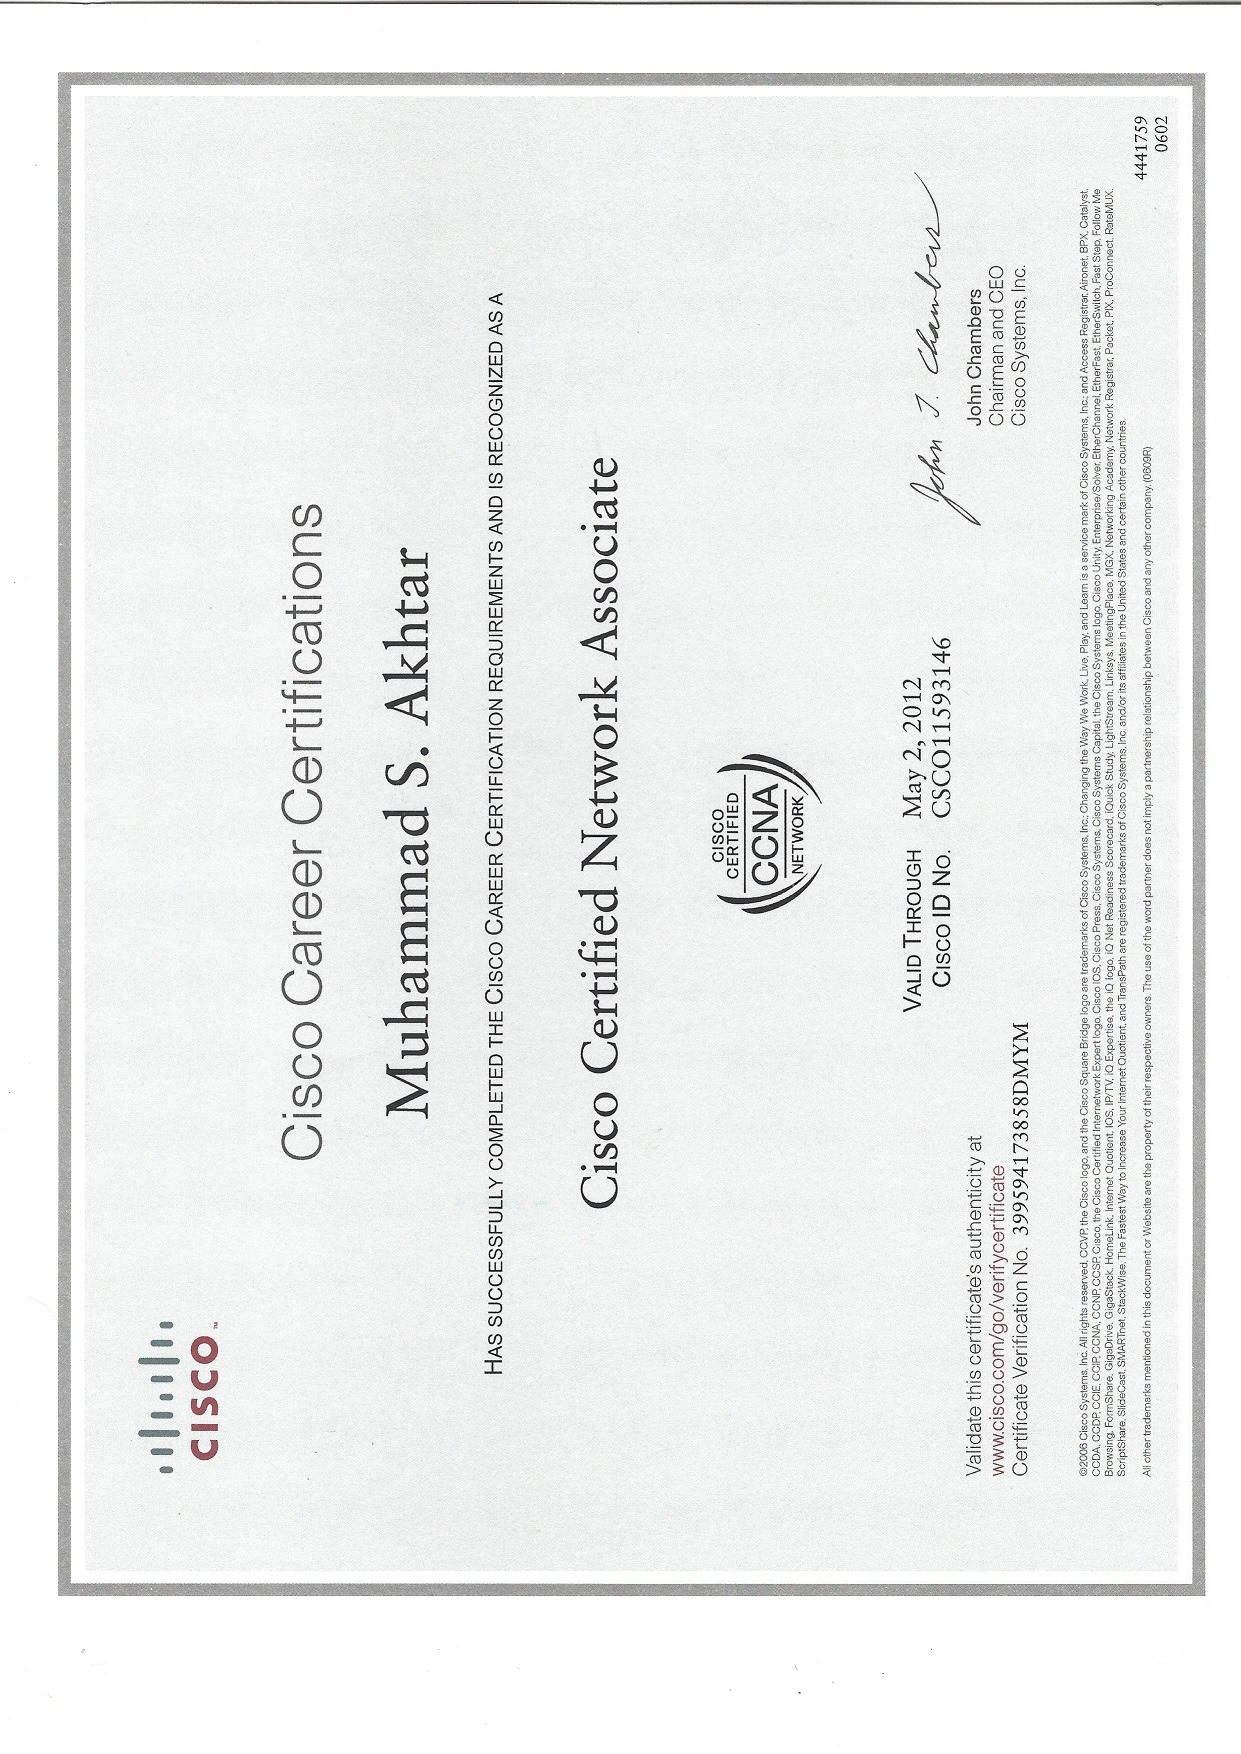 Muhammad saud akhtar bayt ccna certificate xflitez Gallery